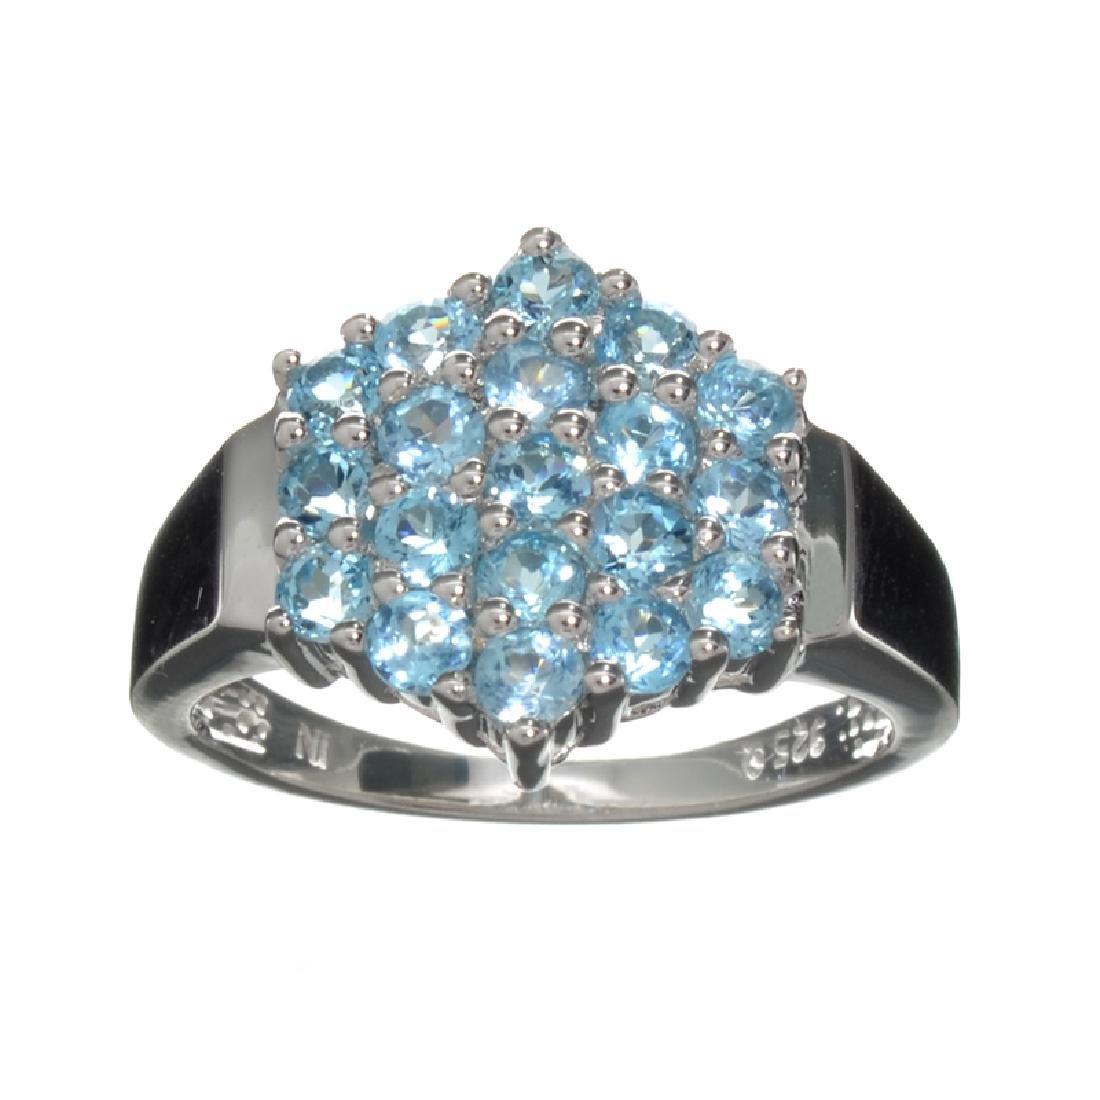 APP: 1k Fine Jewelry 1.50CT Round Cut Light Blue Topaz